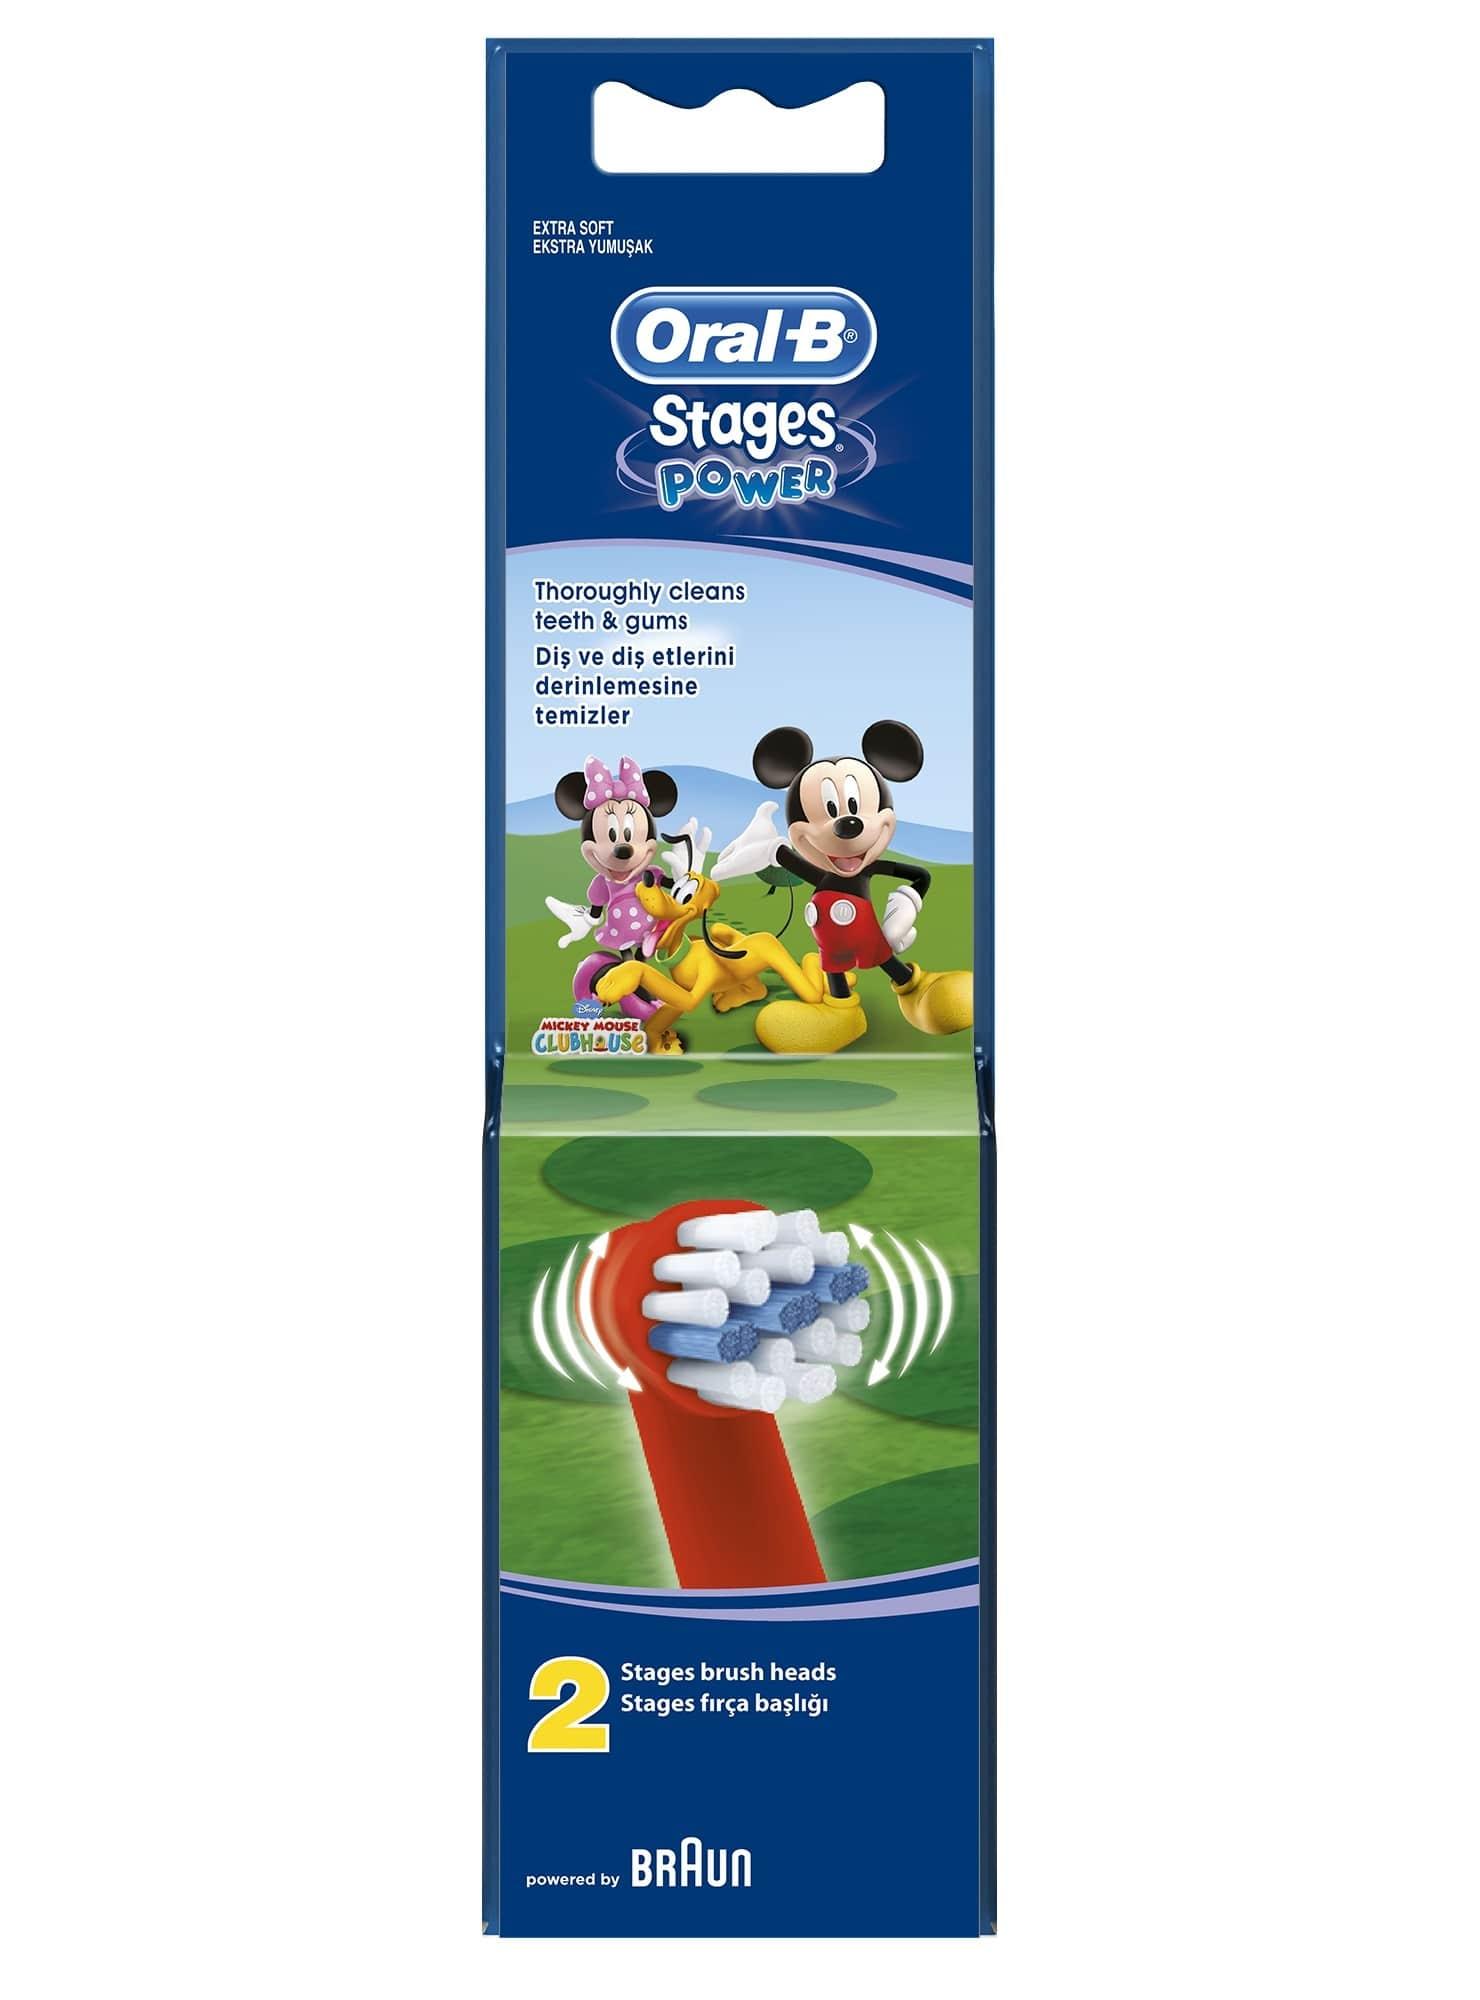 OralB Stages Power Kids Mickey Ανταλλακτικά Παιδικής Ηλεκτρικής Οδοντόβουρτσας, 2 τεμάχια